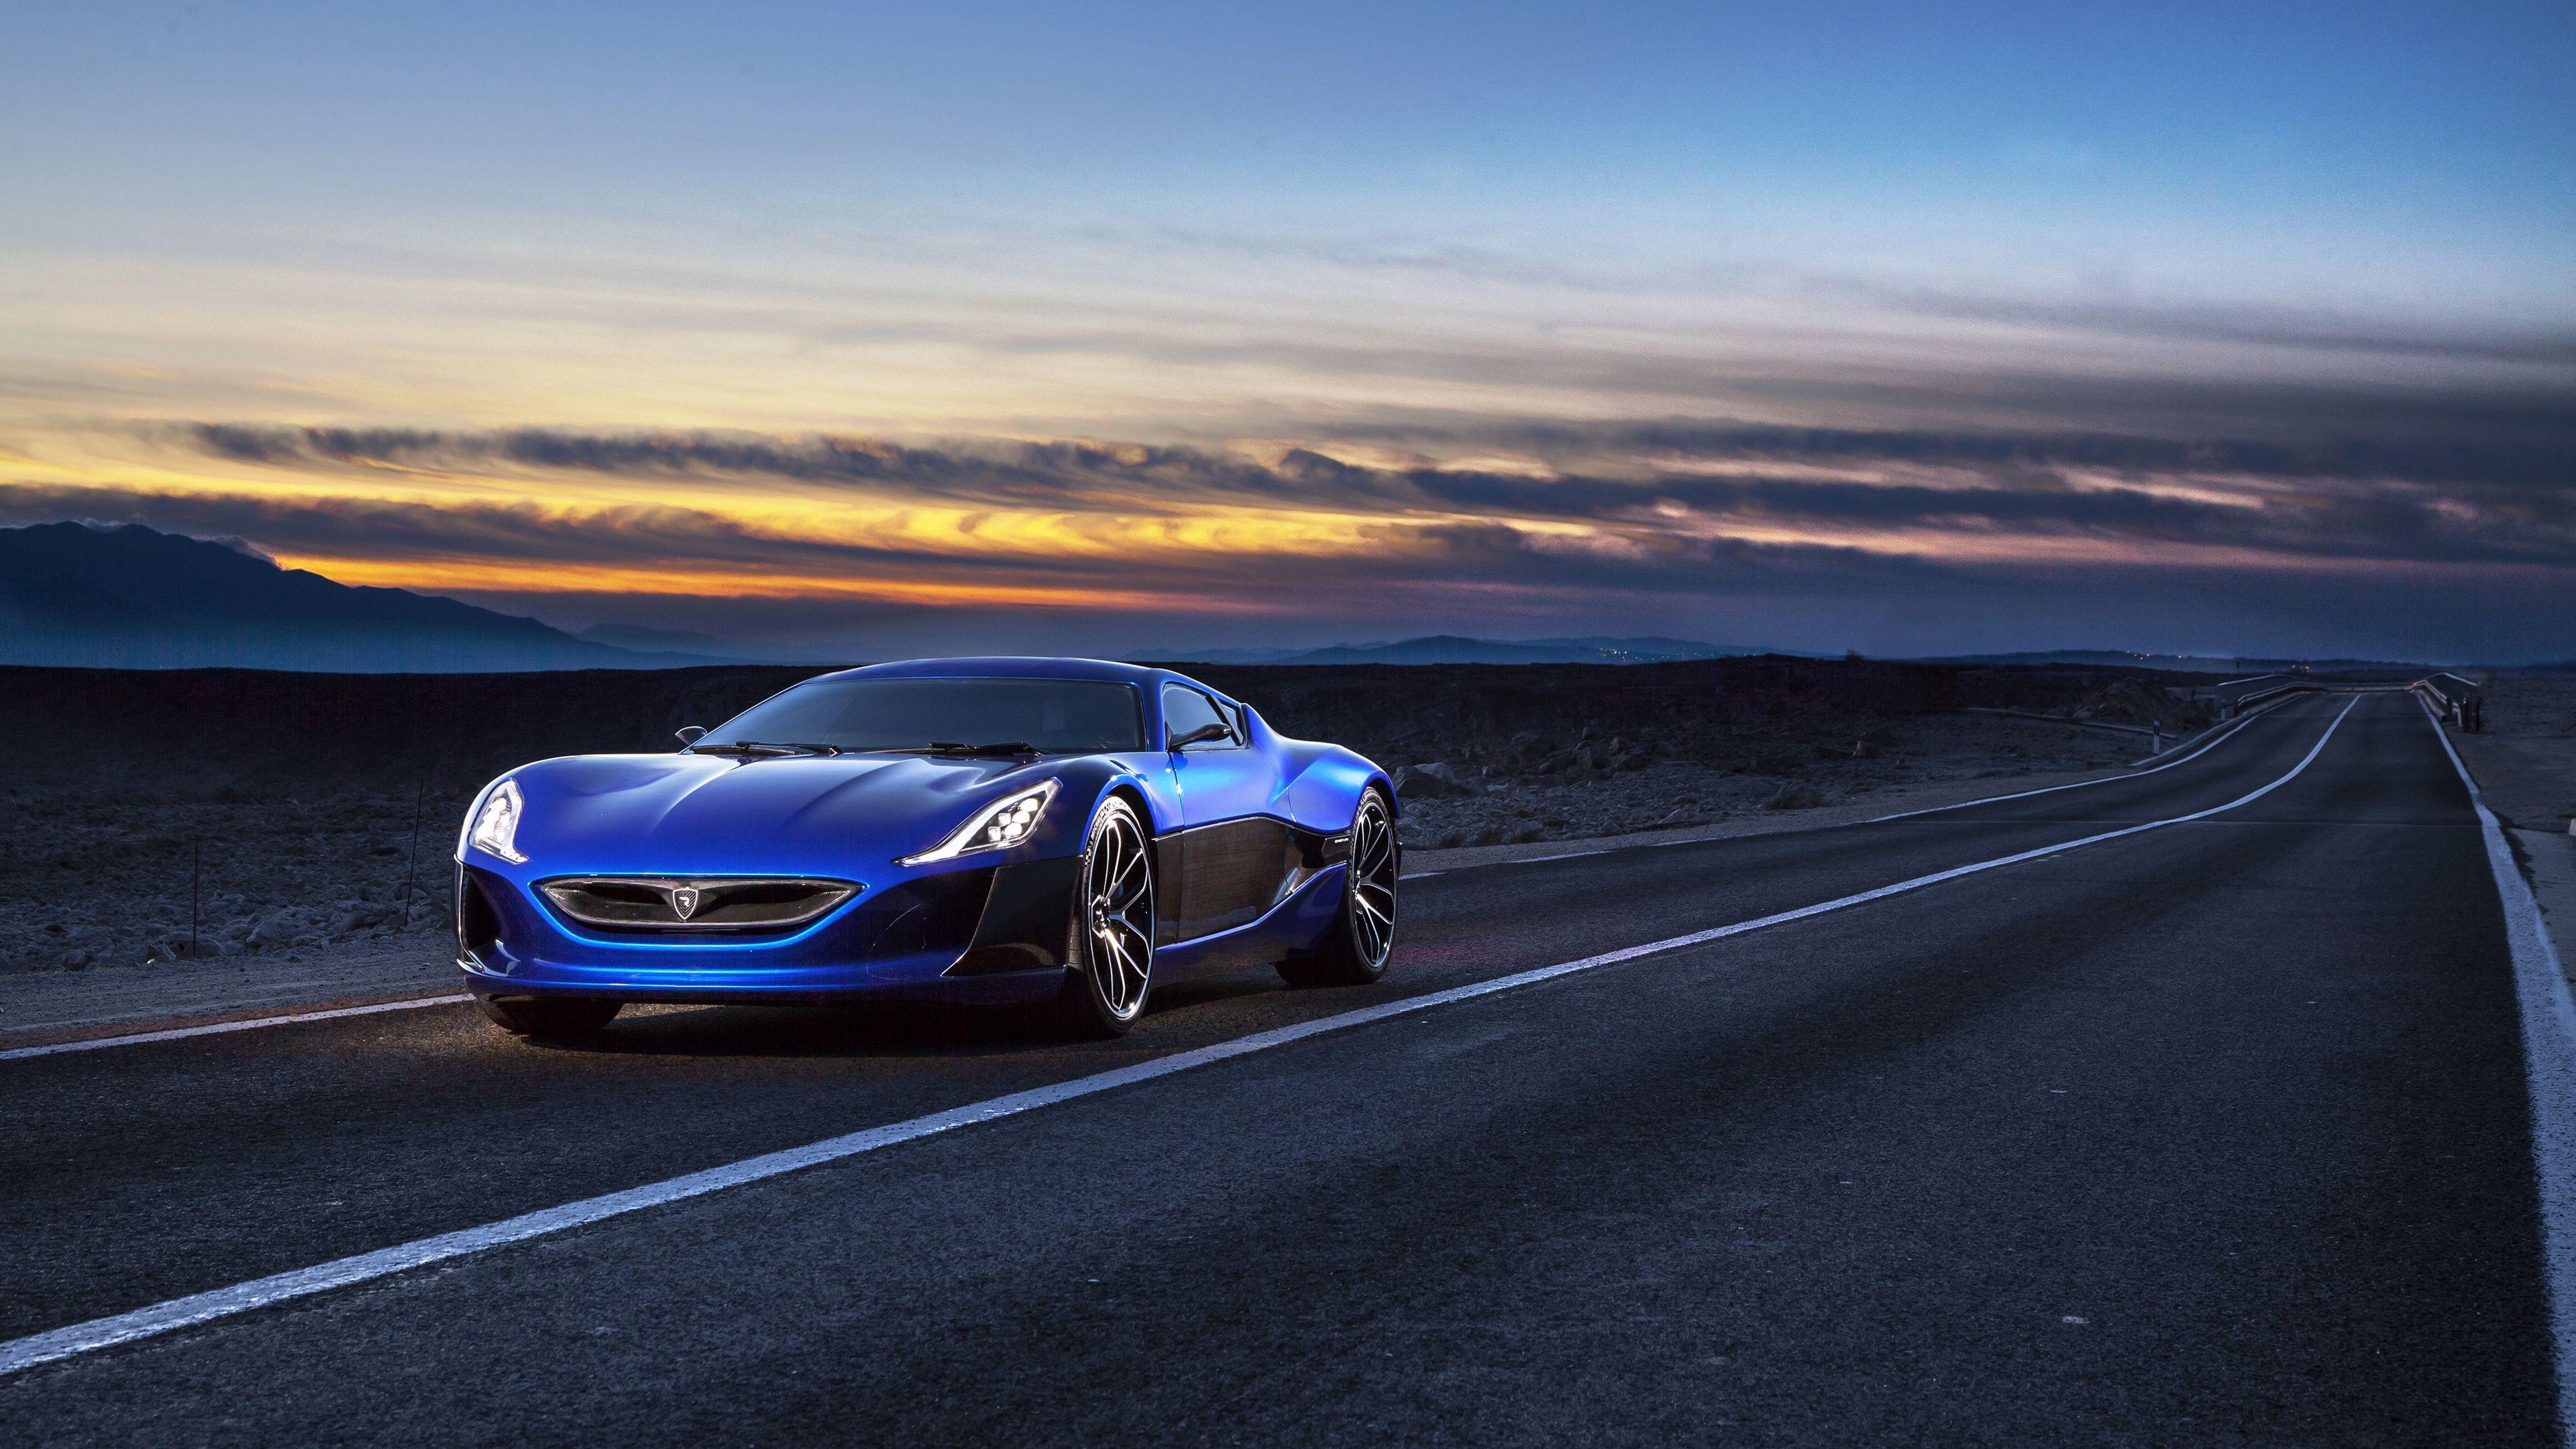 Rimac Electric Car Concept 4k Rimac Electric Car Concept Electric Car Concept Super Cars Car Wallpapers